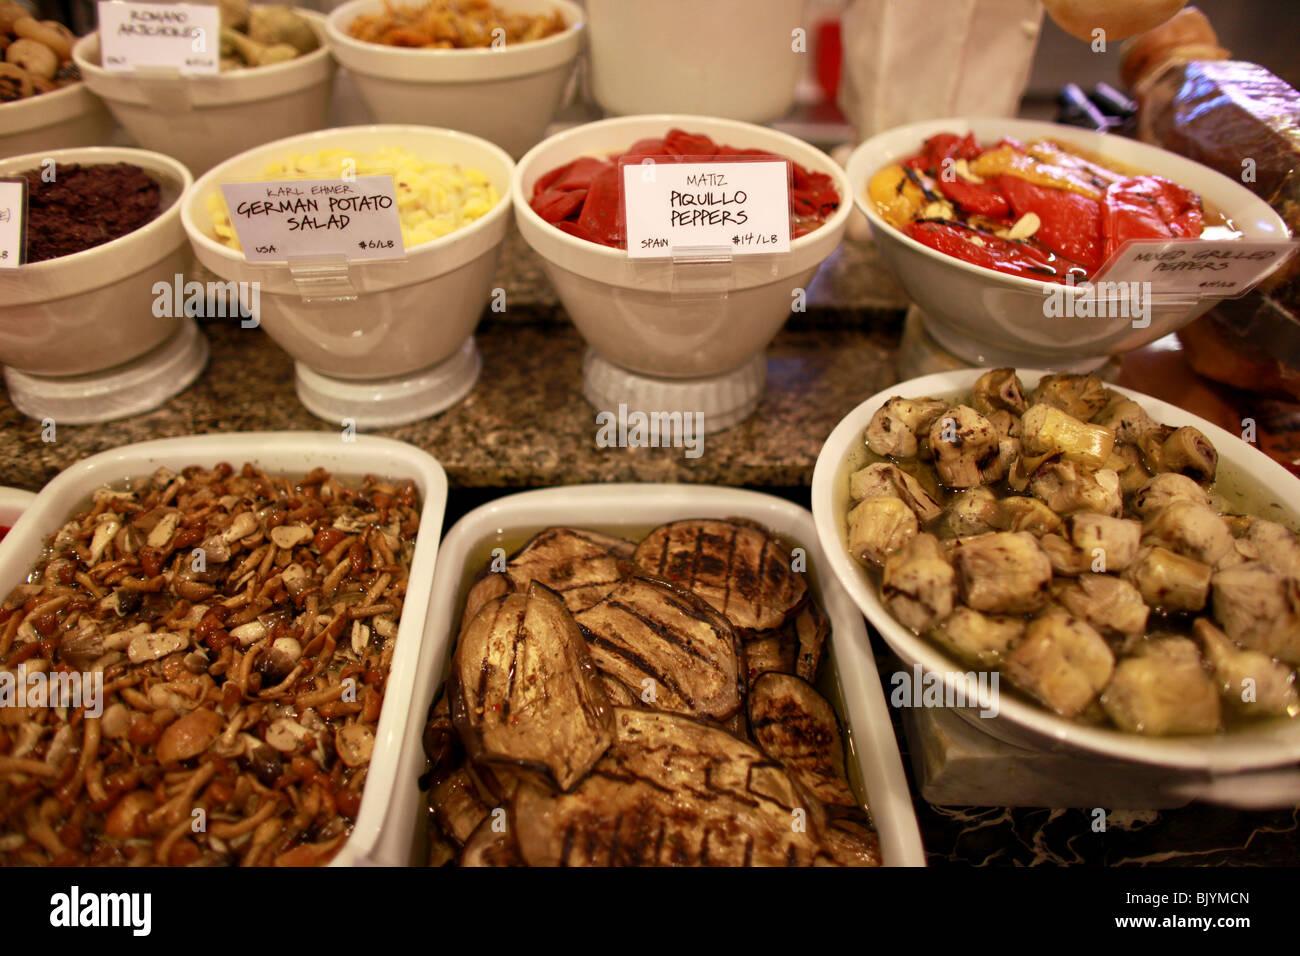 Gourmet Food Store New York